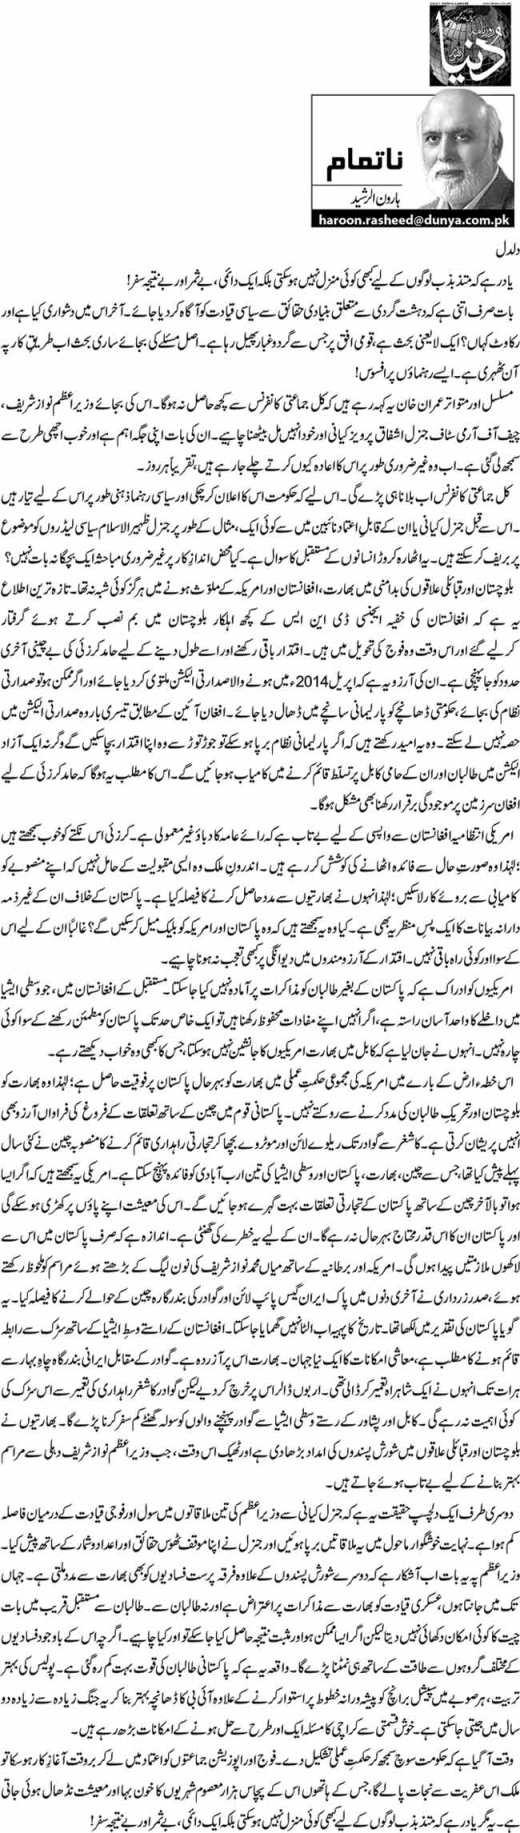 Daldal - Haroon-ur-Rasheed